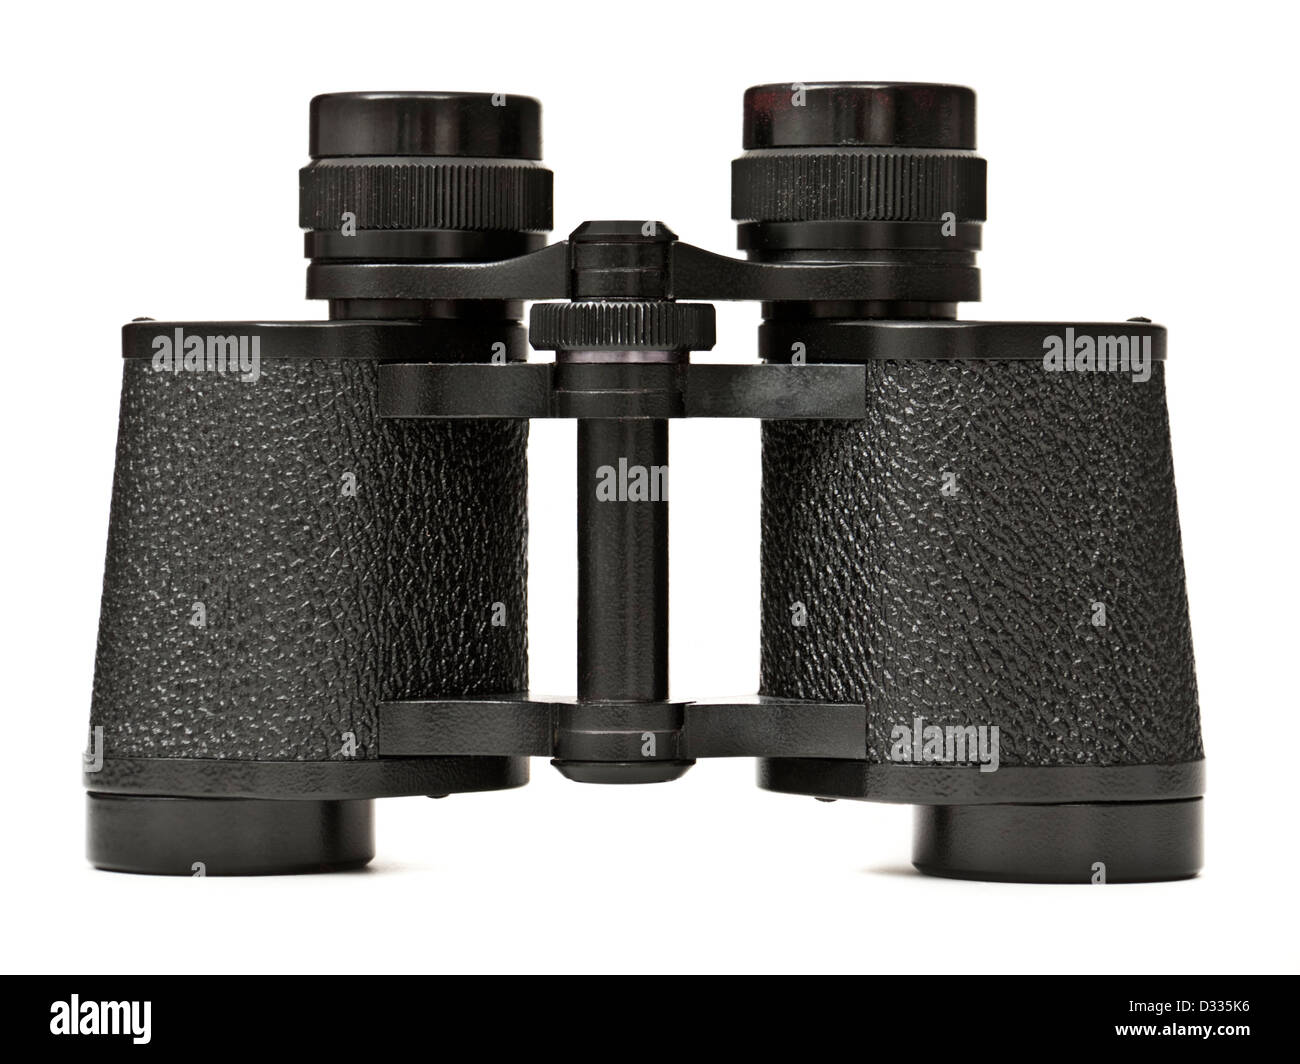 Vintage Carl Zeiss (Jena) 8x30W Jenoptem multi-coated binoculars, made in the DDR. - Stock Image